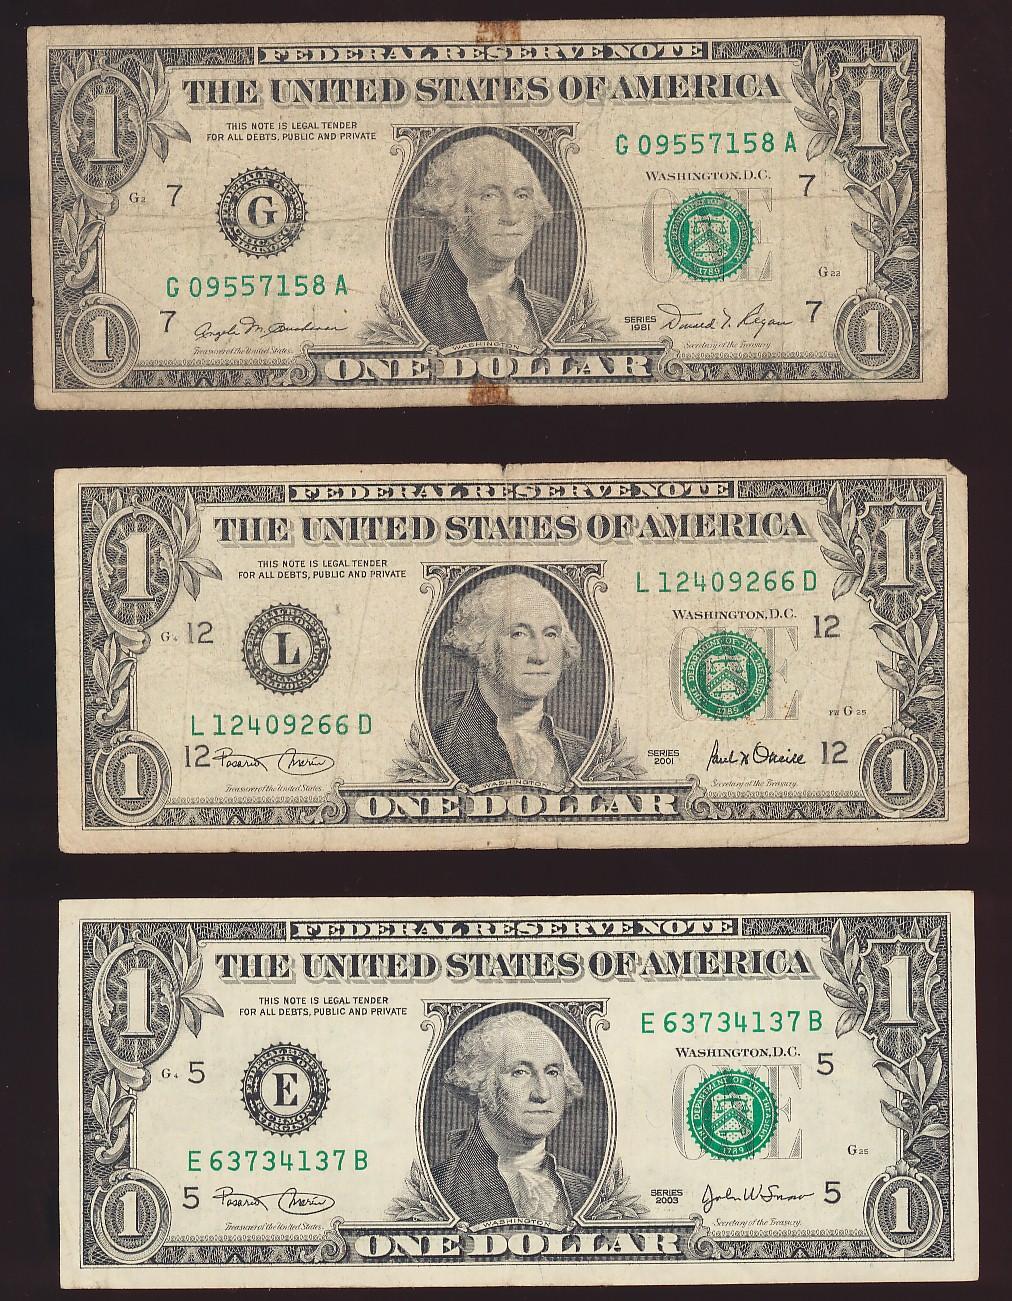 Jk Collection World 1 AMERICAN DOLLER